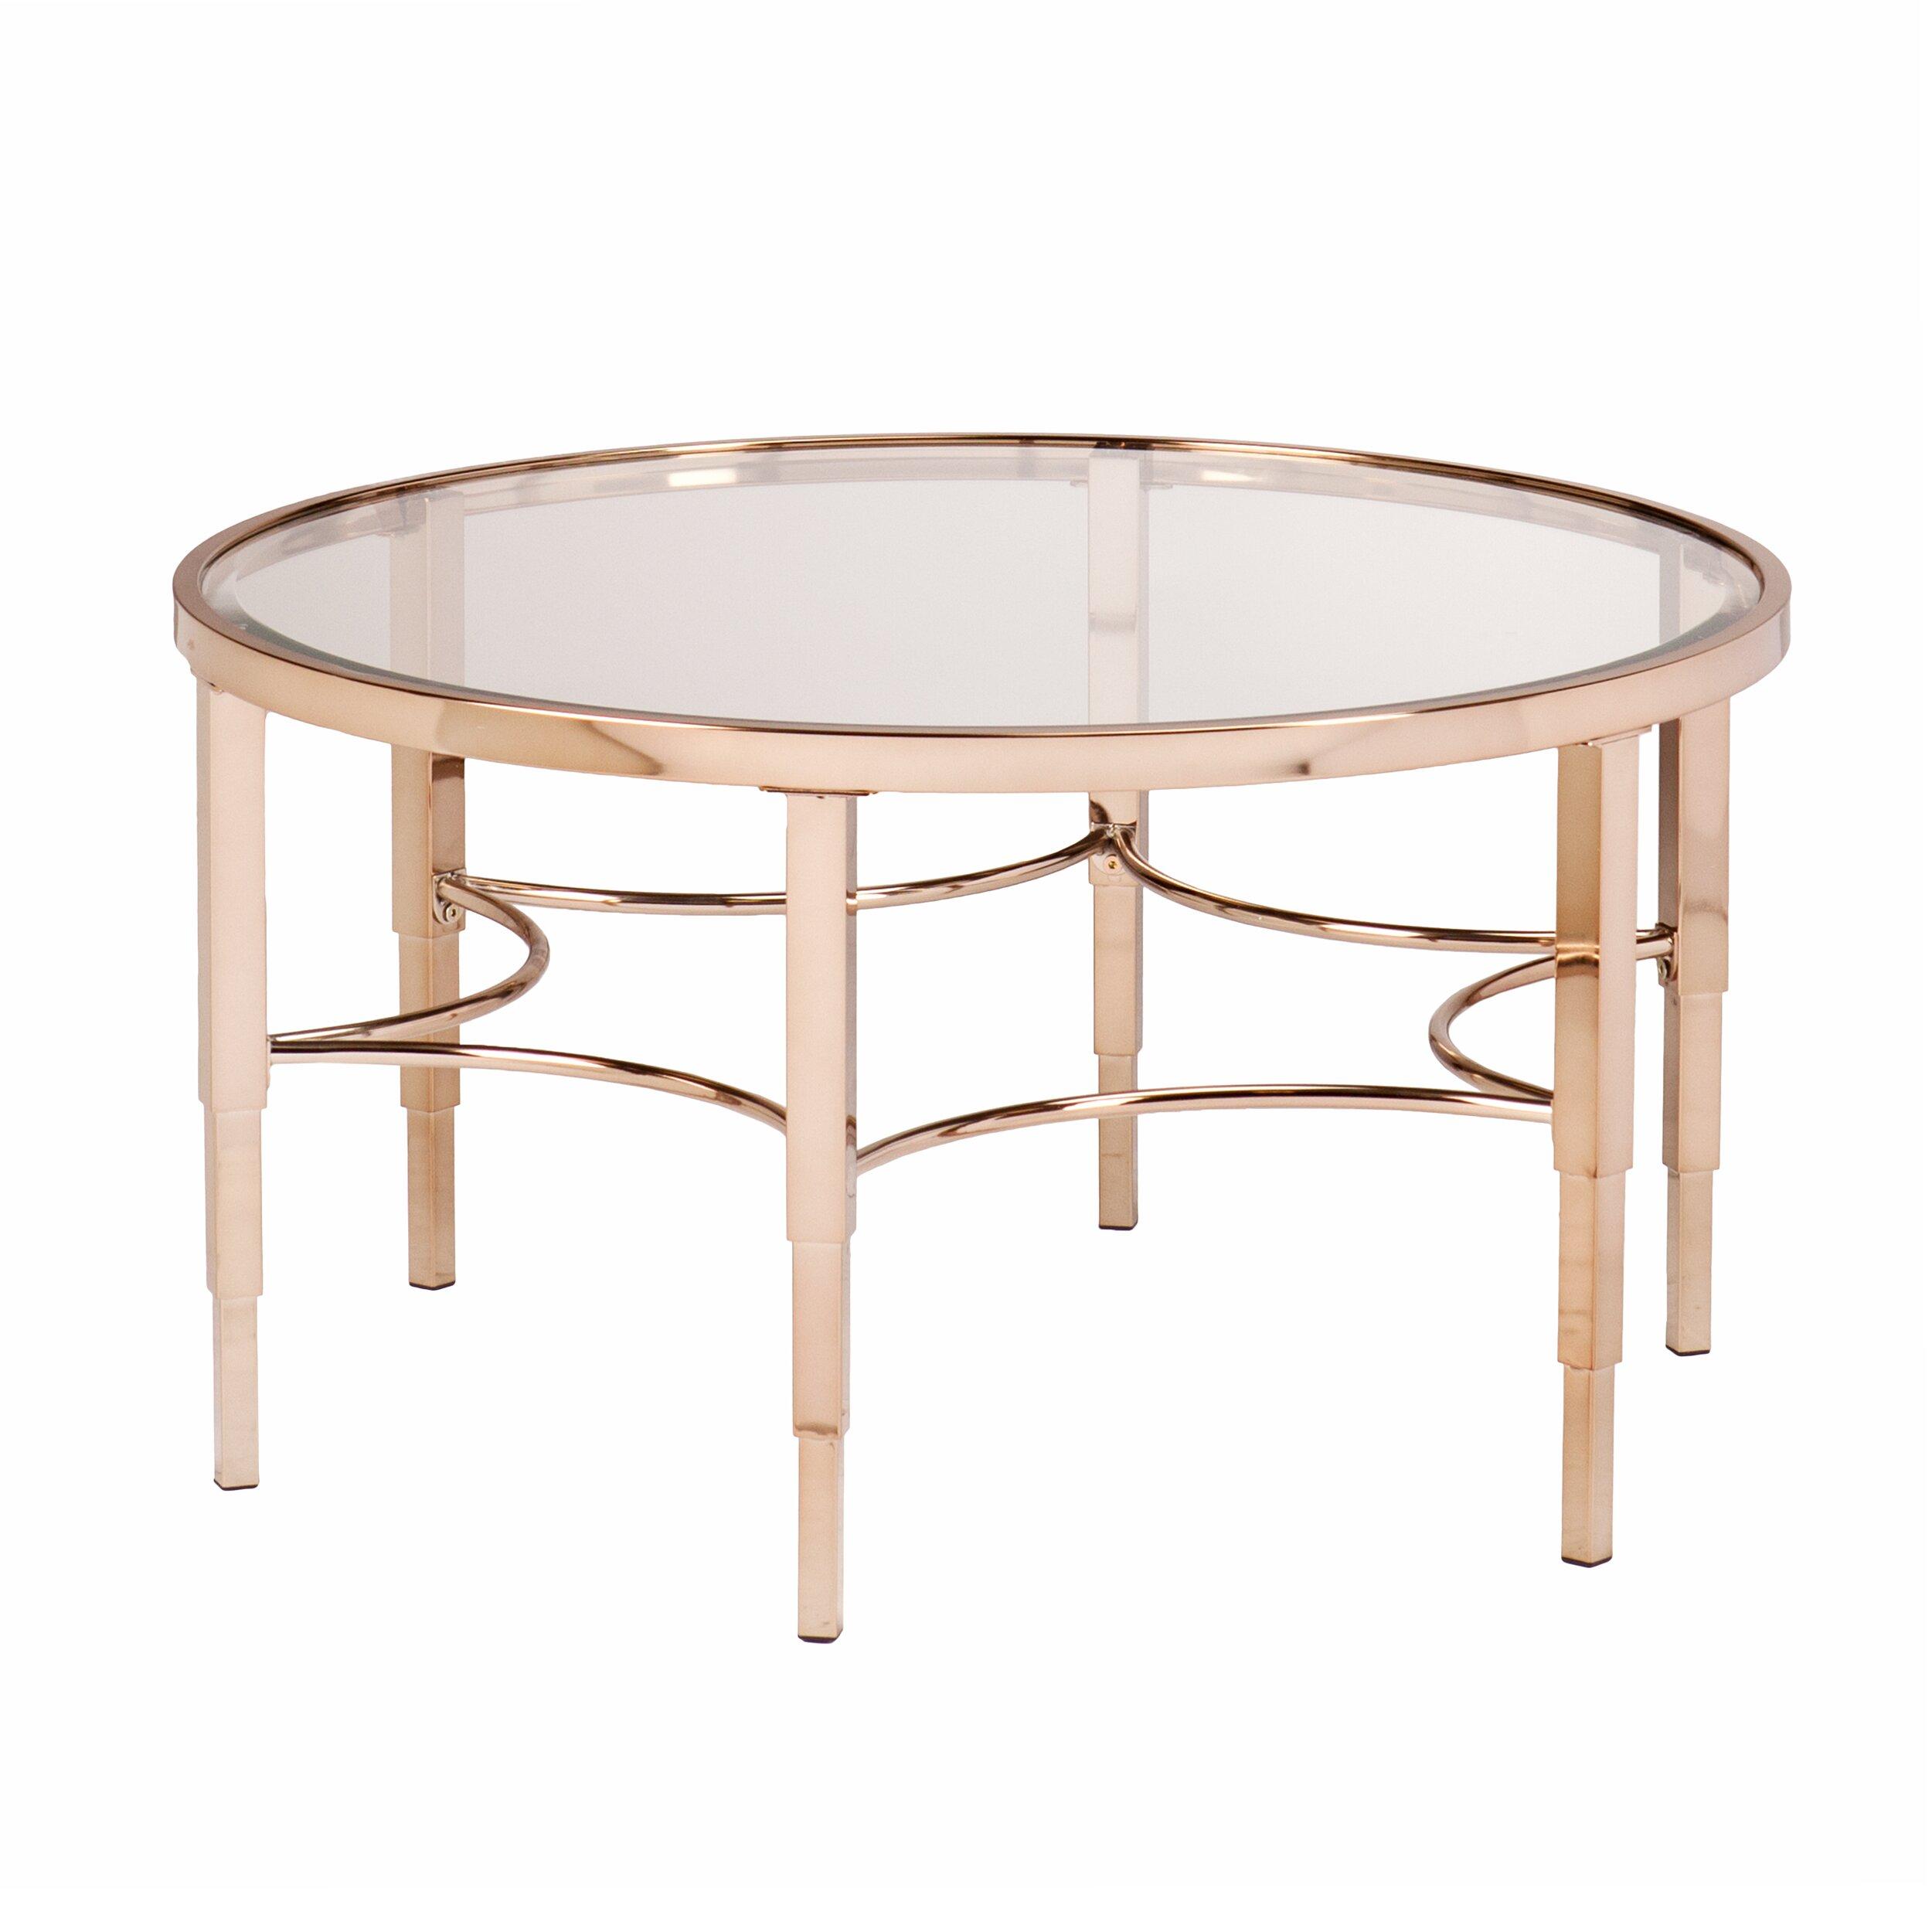 Furniture Living Room Furniture Coffee Tables House Of Hampton SKU